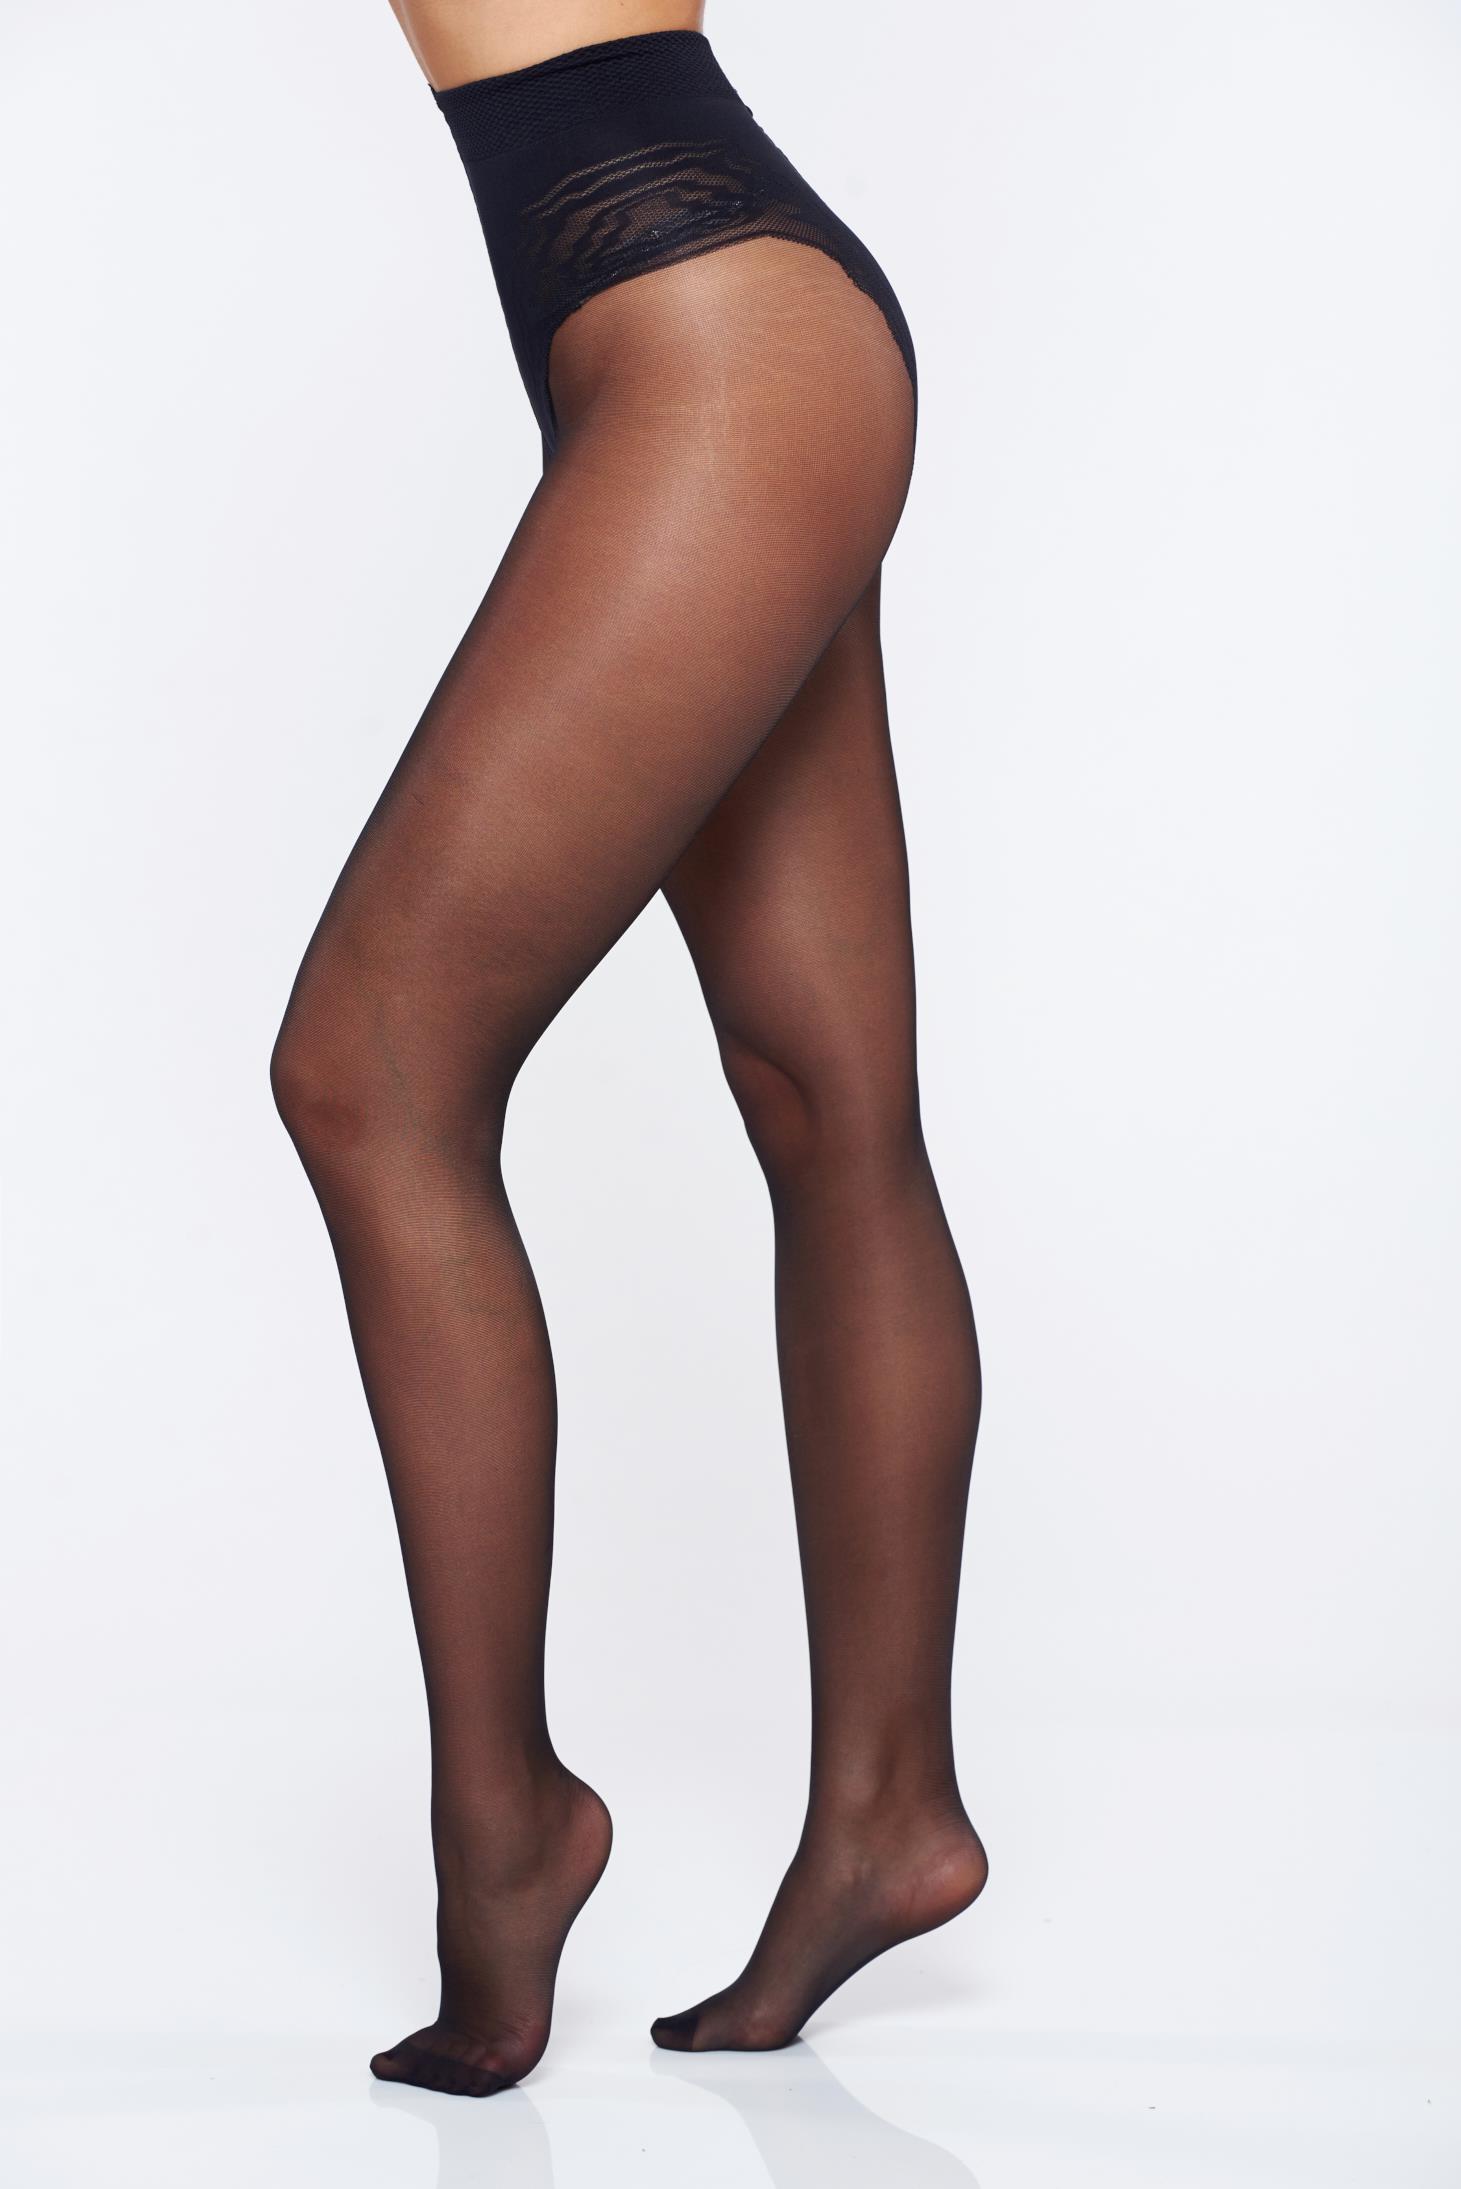 Dres dama modelator negru 20 den calcai curbat cusaturi plate